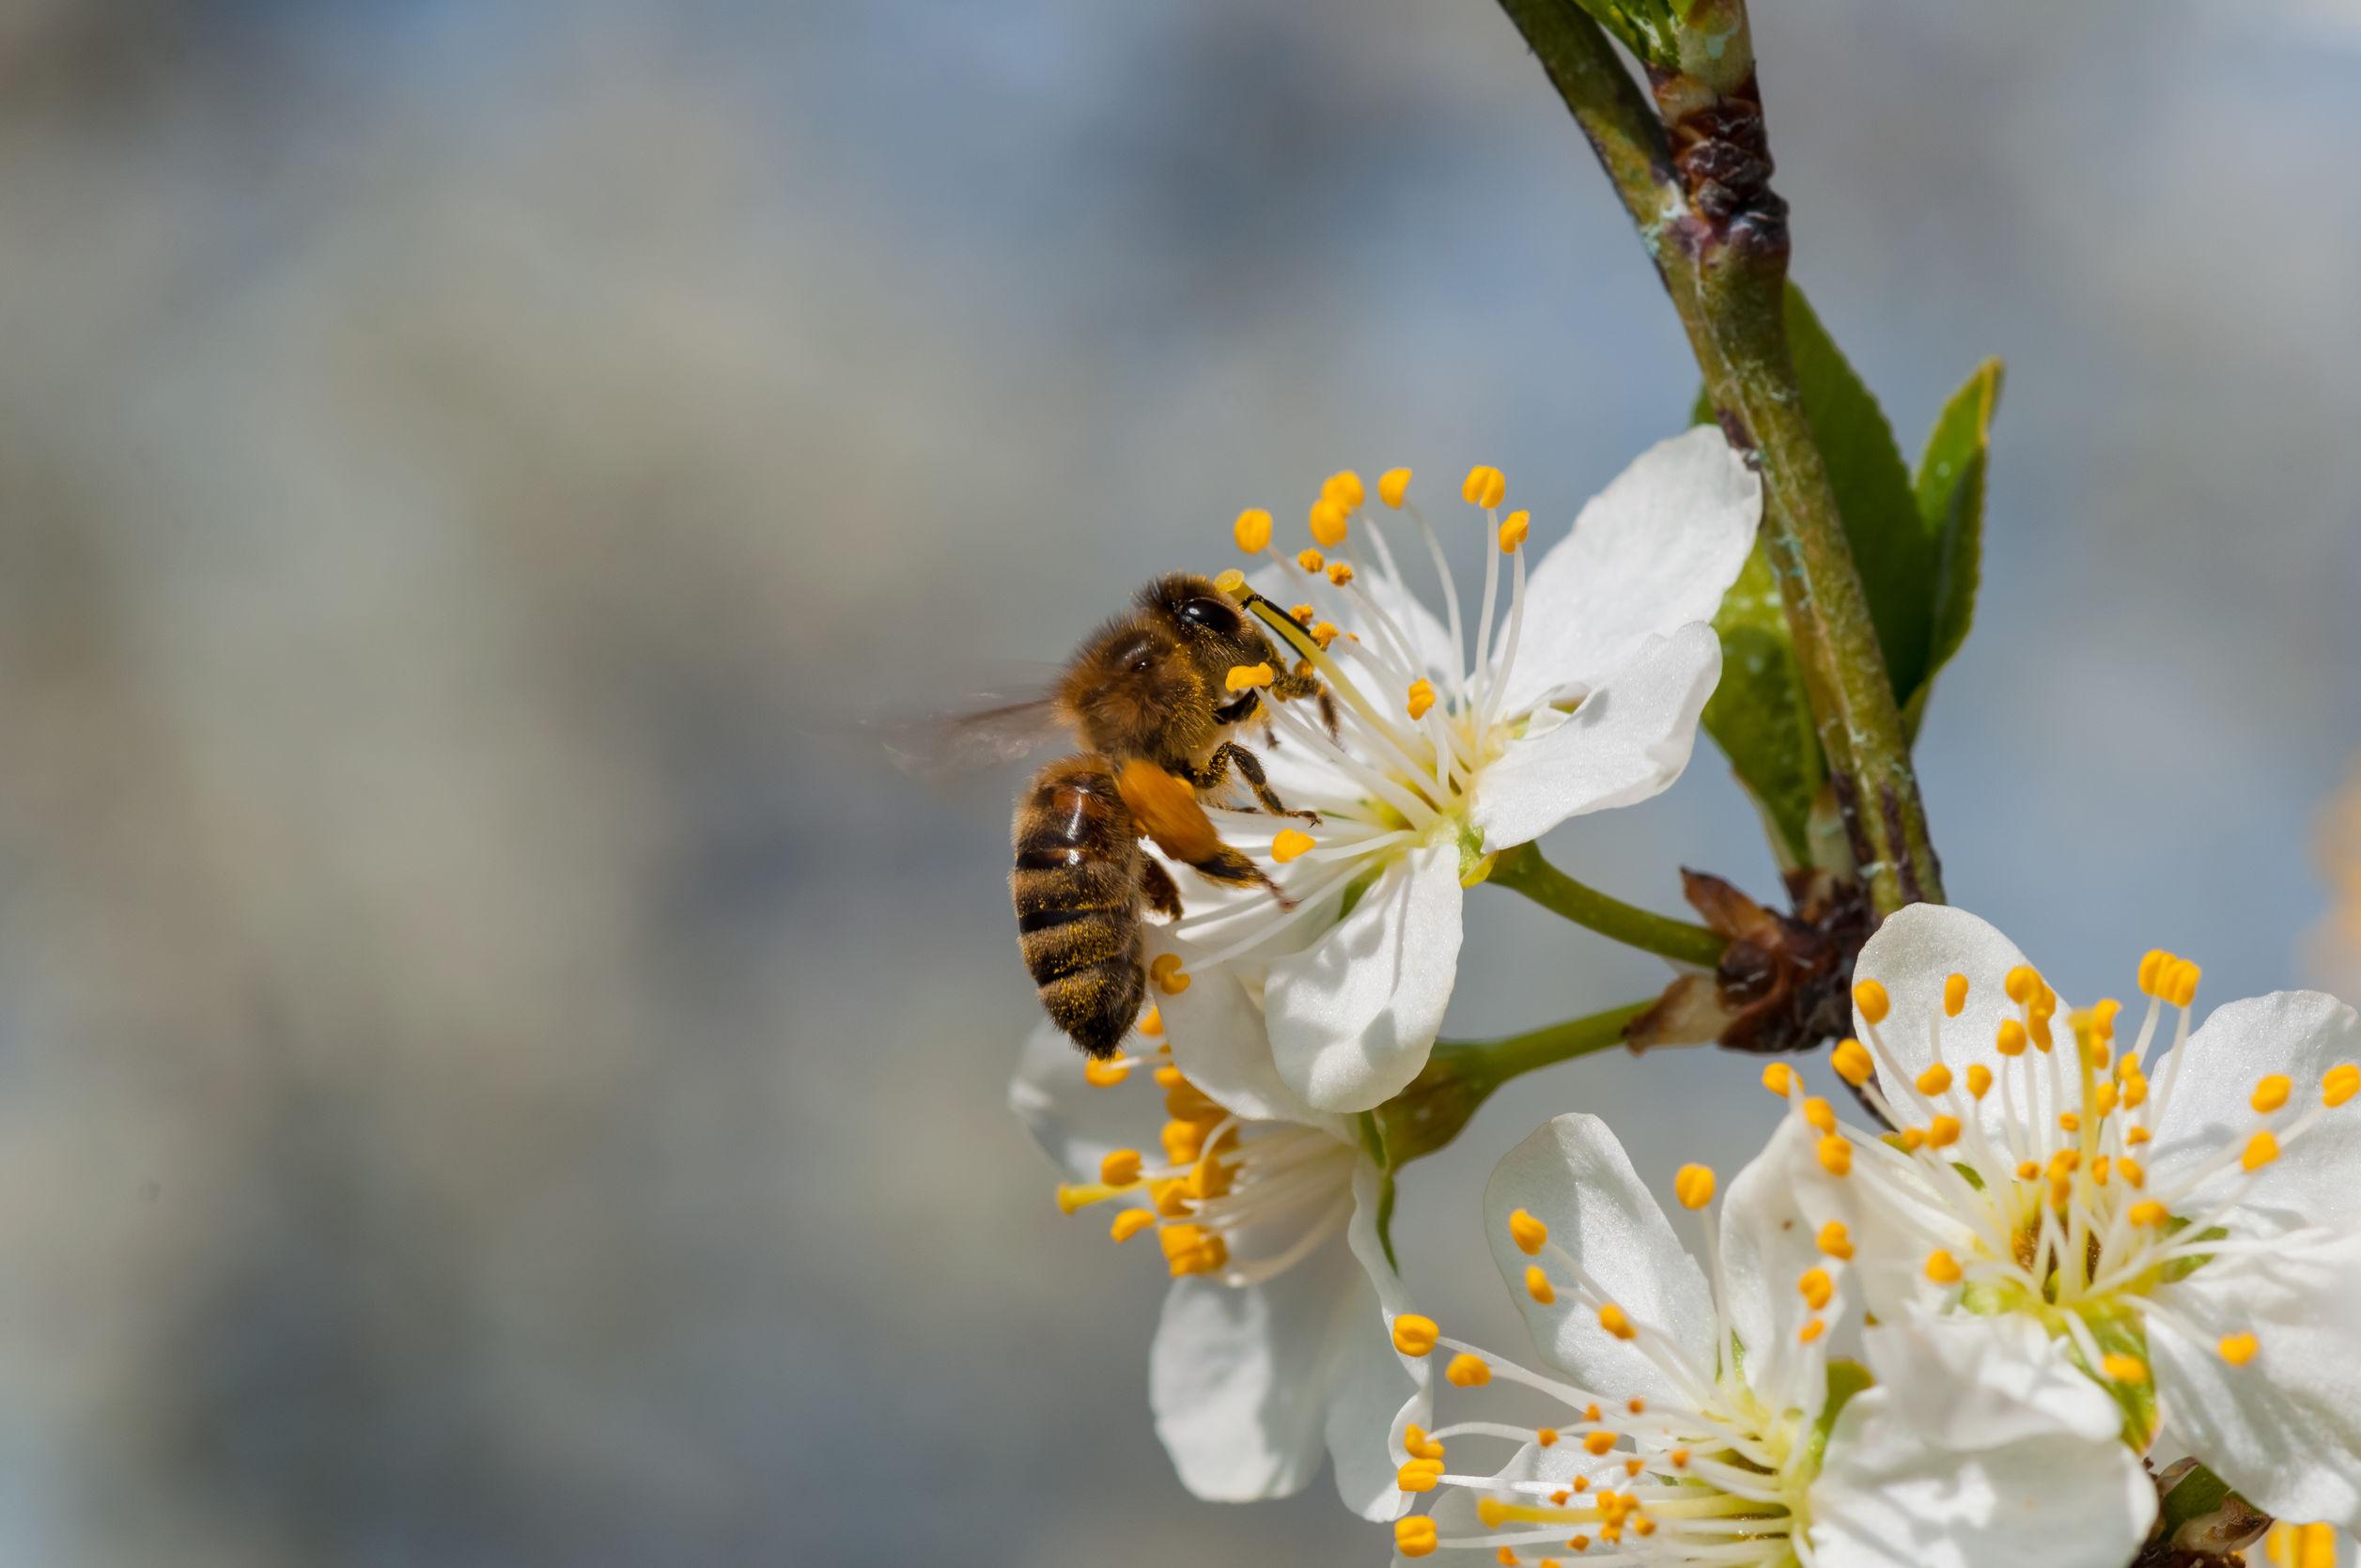 Honeybee on white plum flowers macro